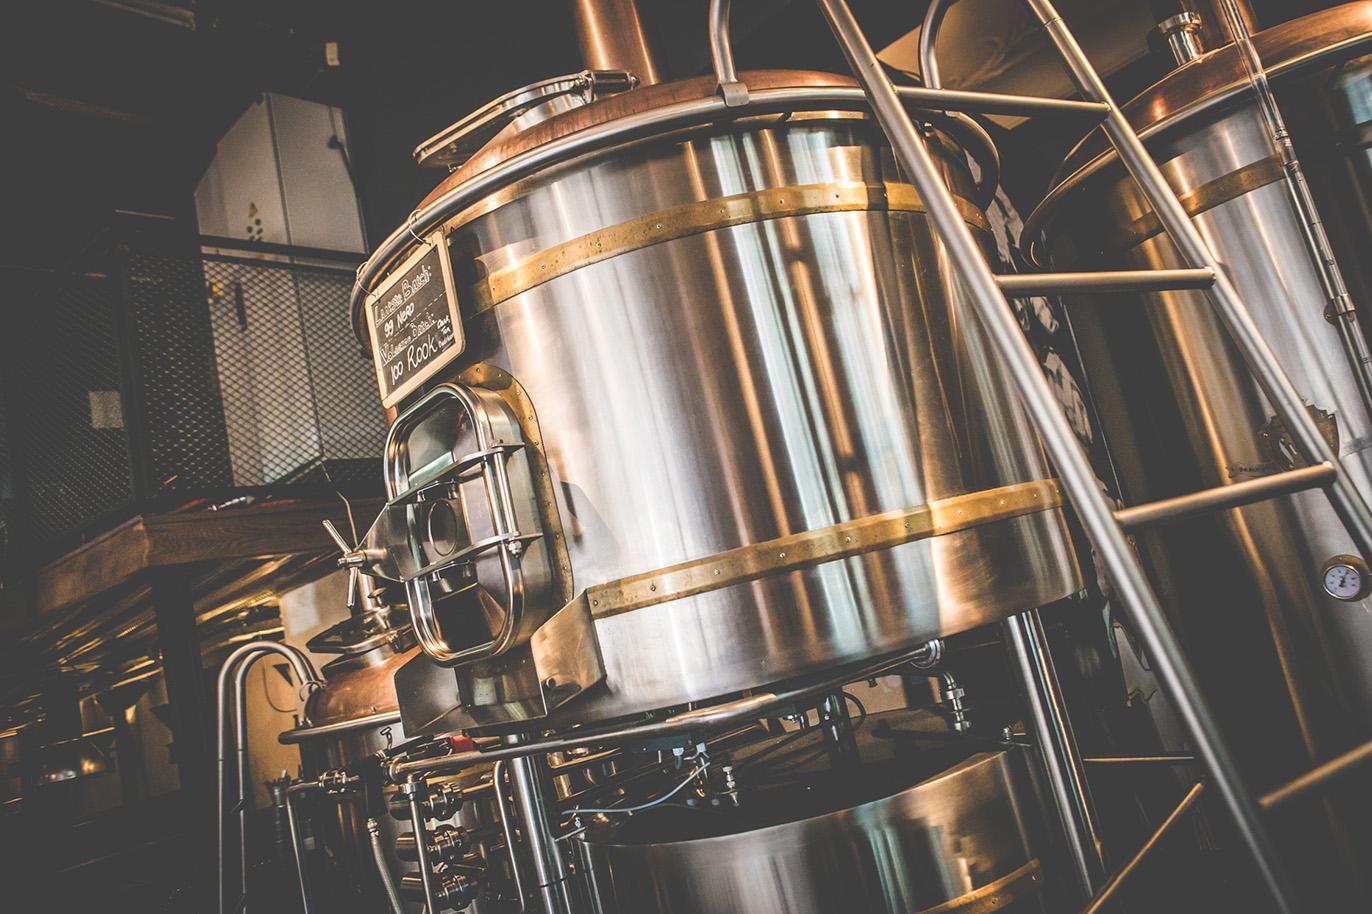 Bierfabriek Amsterdam - Bierbrouwerij